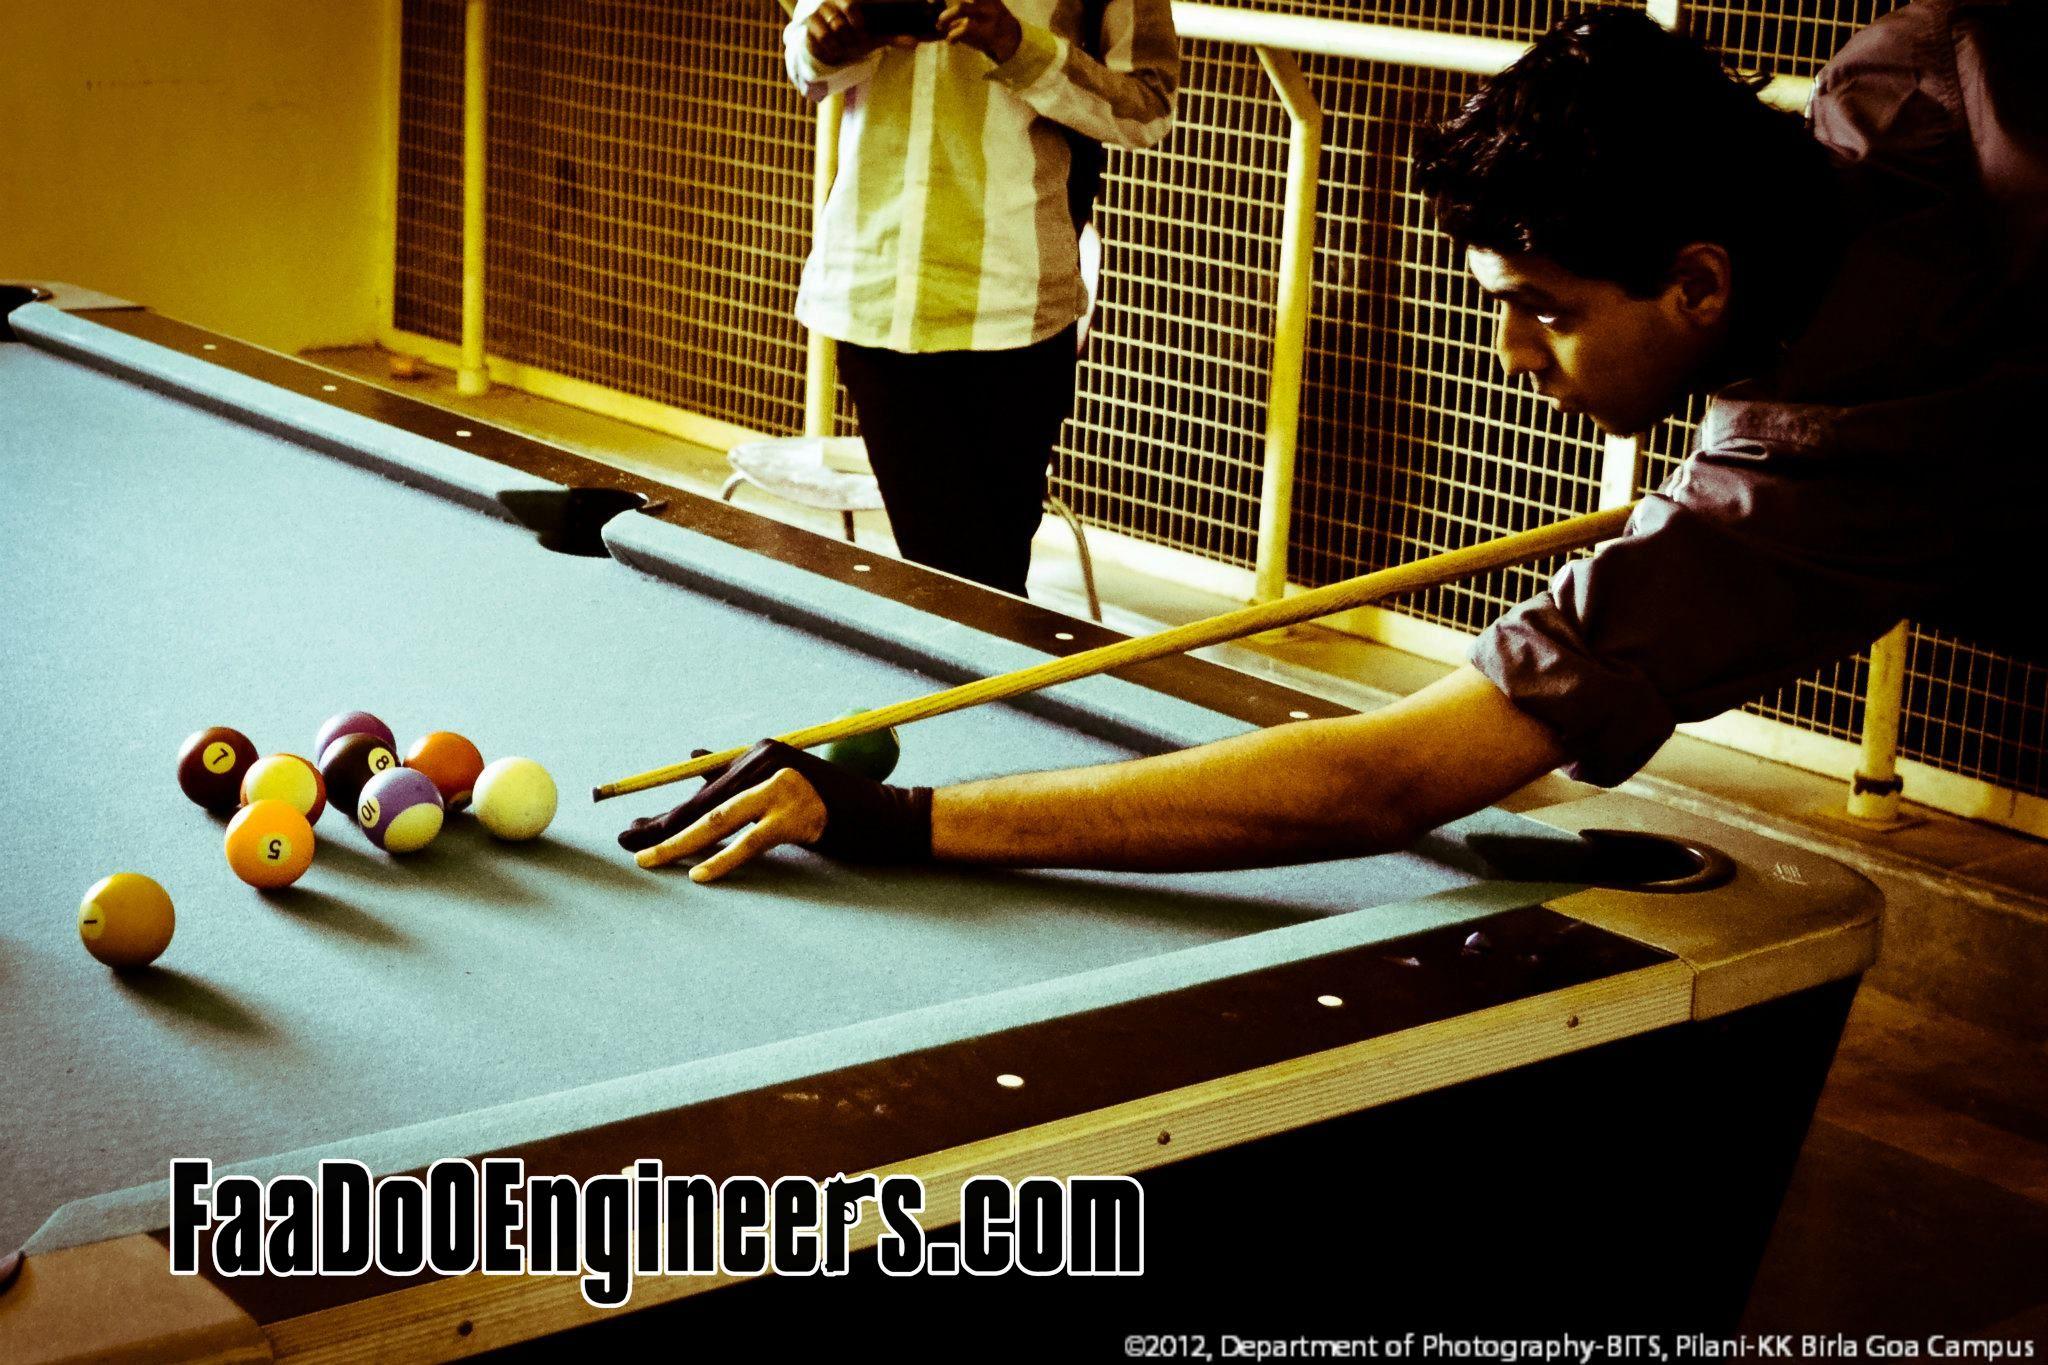 spree-2013-bits-pilani-goa-campus-sports-fest-photos-gallery-005